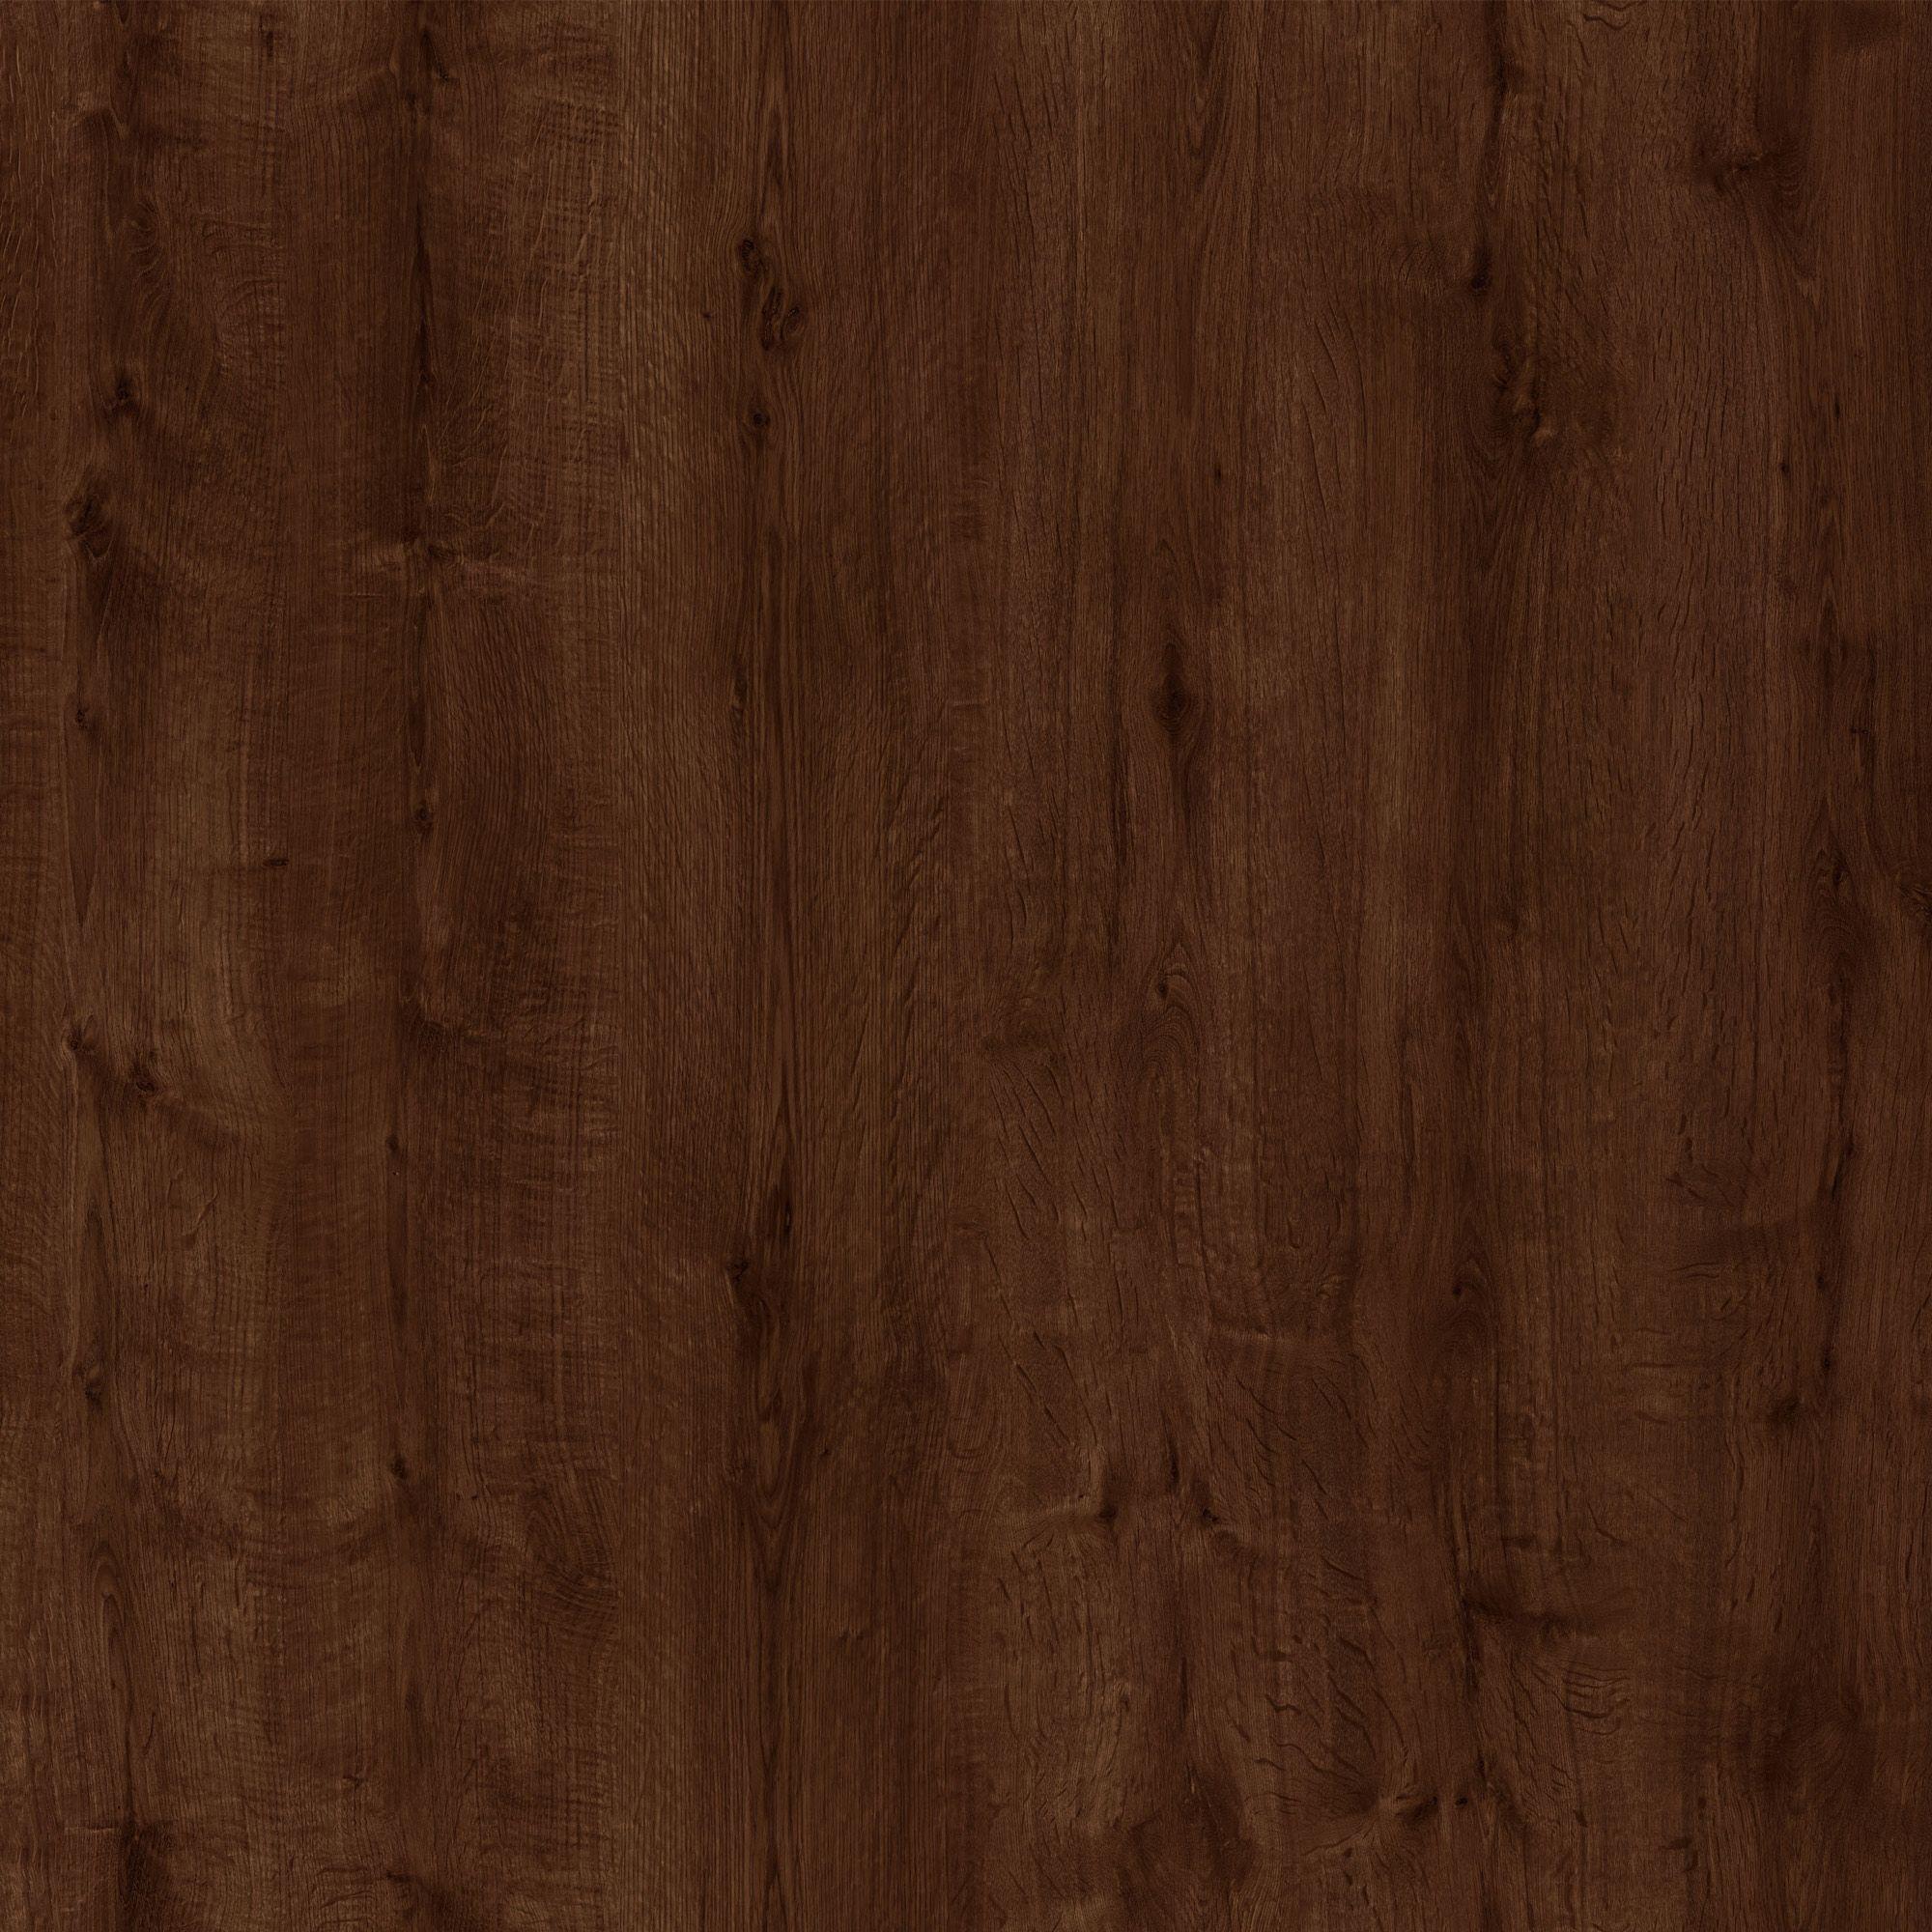 Dark Laminate Flooring Bq